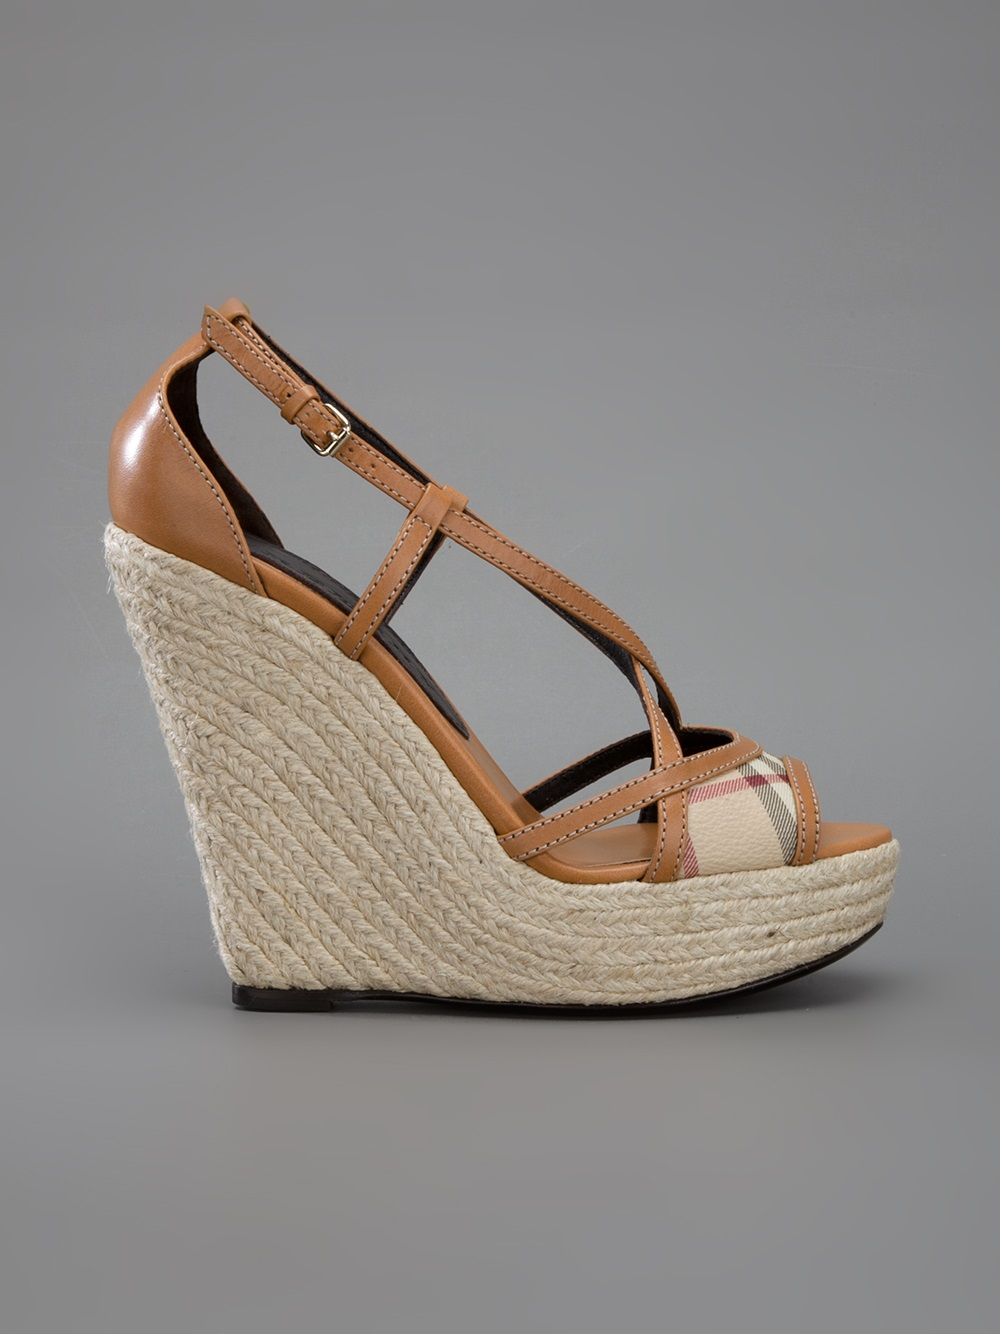 55f8da62732 Lyst - Burberry Lanyard Wedge Sandal in Brown